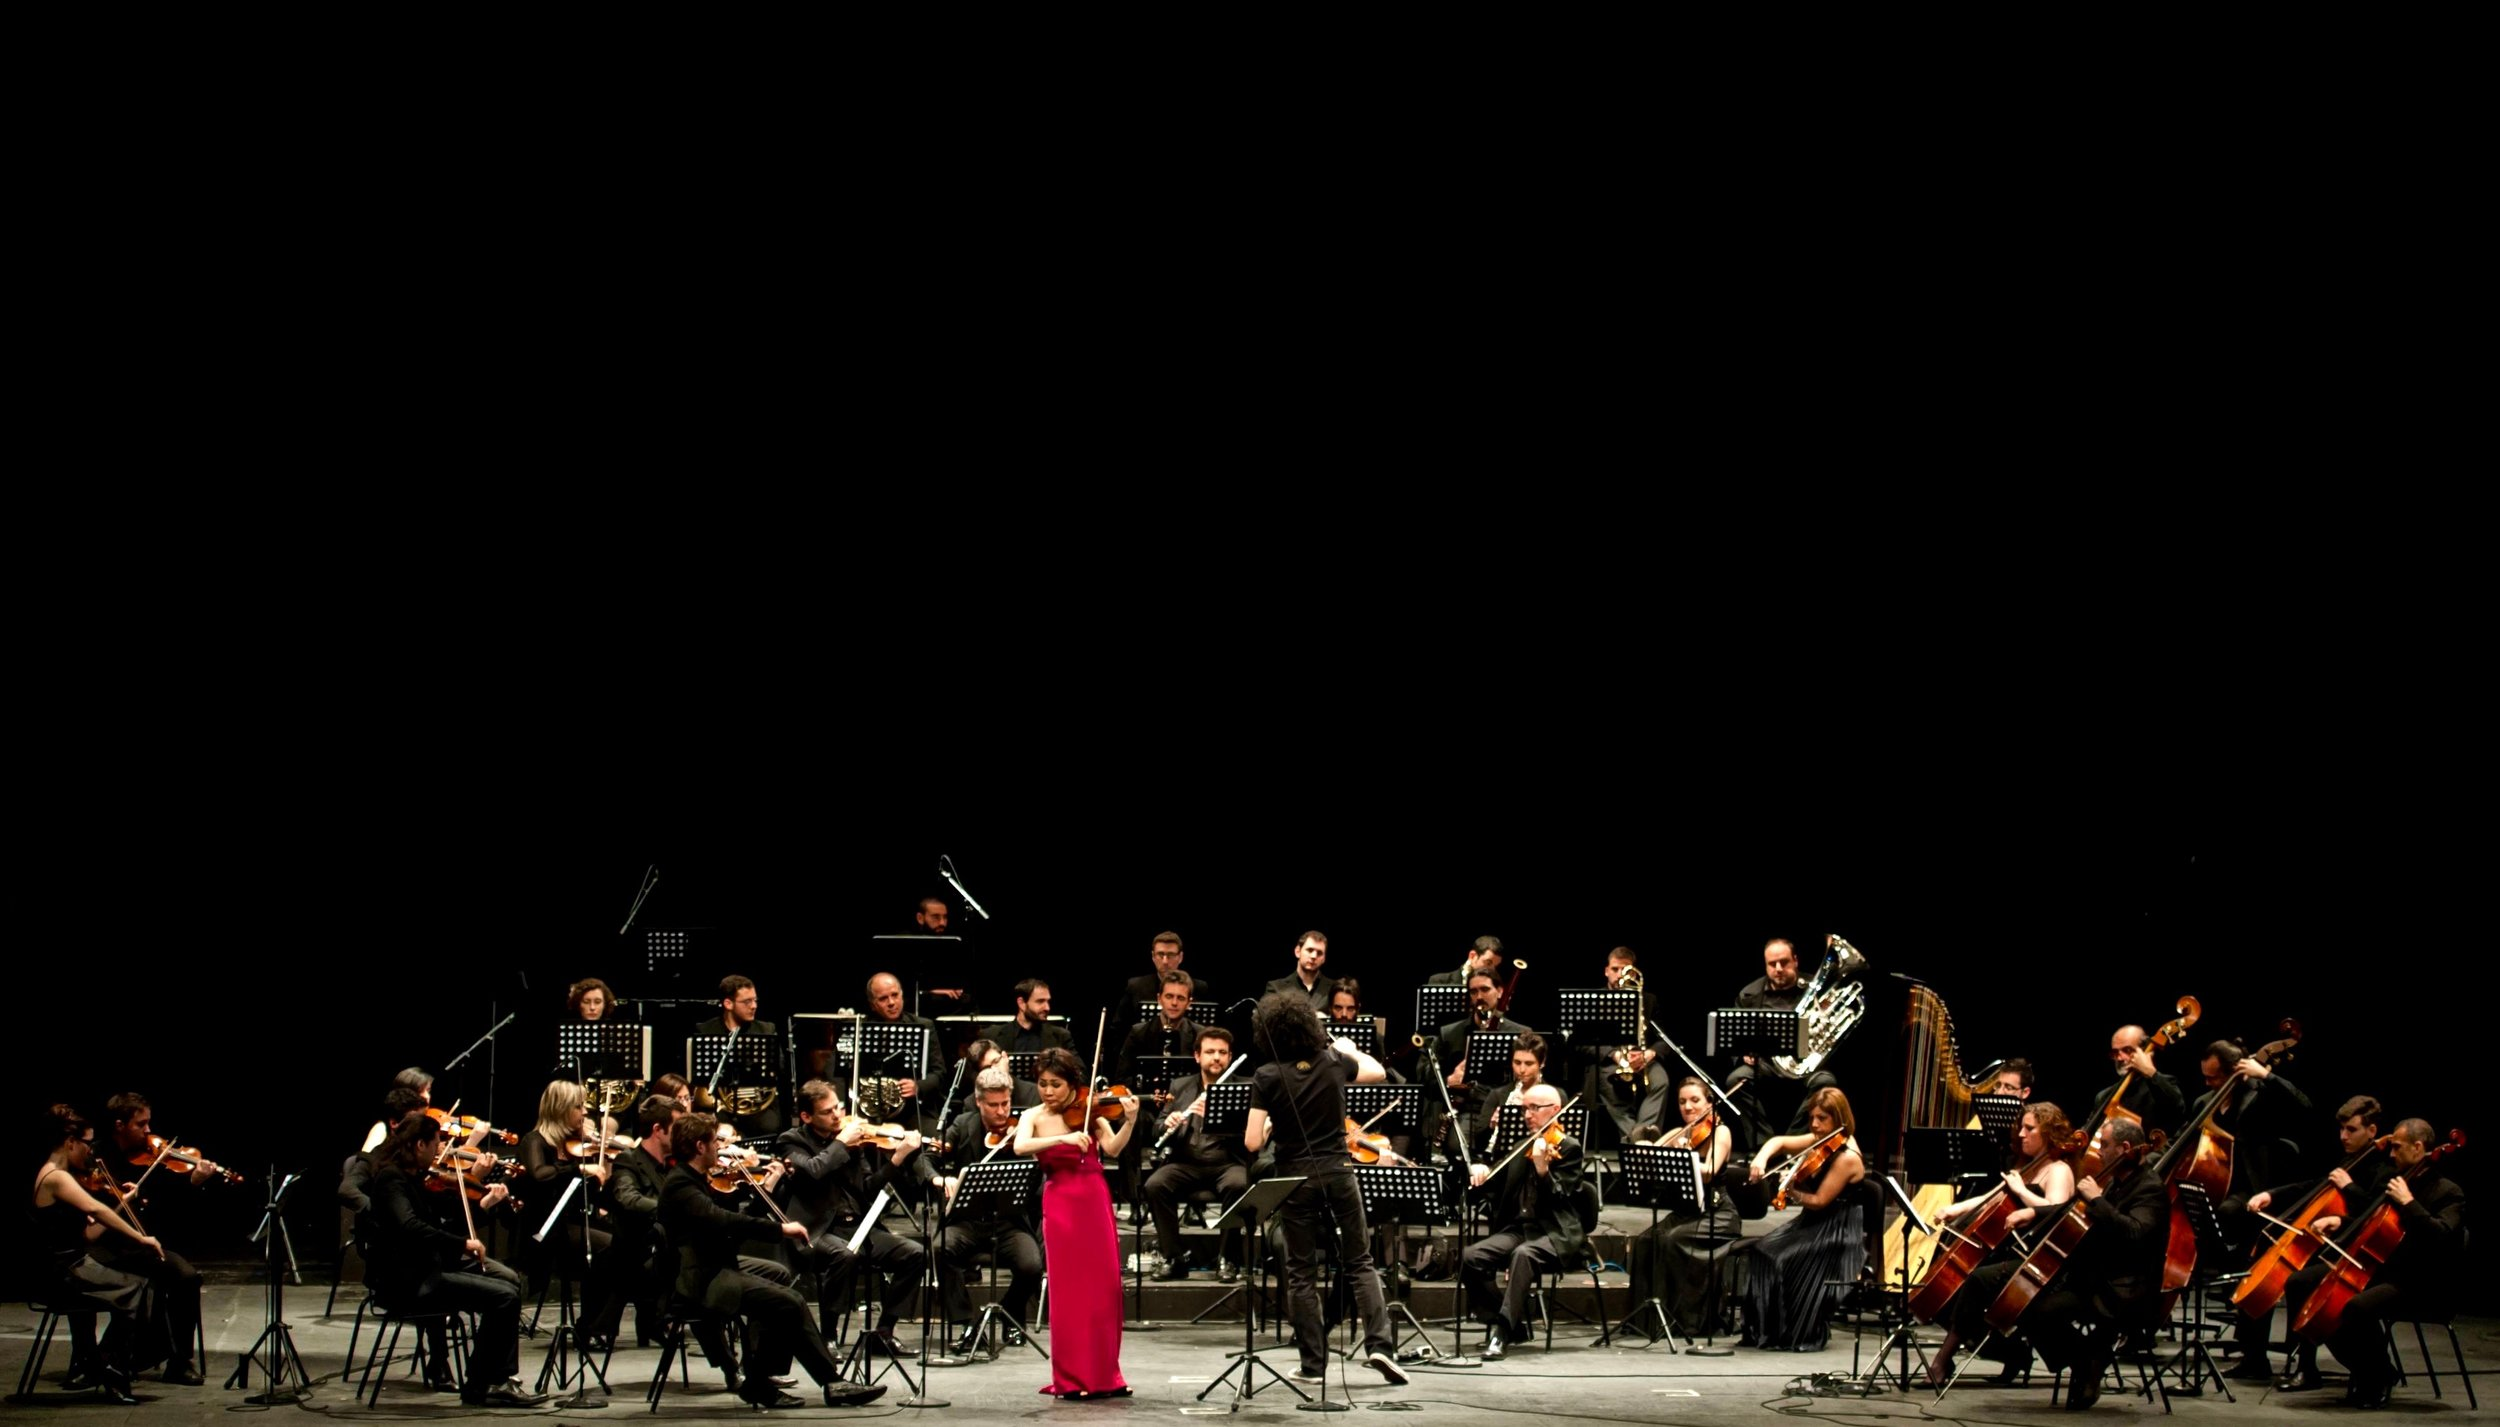 Foto-concerto-giovanni-allevi-Milano-21-aprile-2013_Prandoni_002 (1).jpg